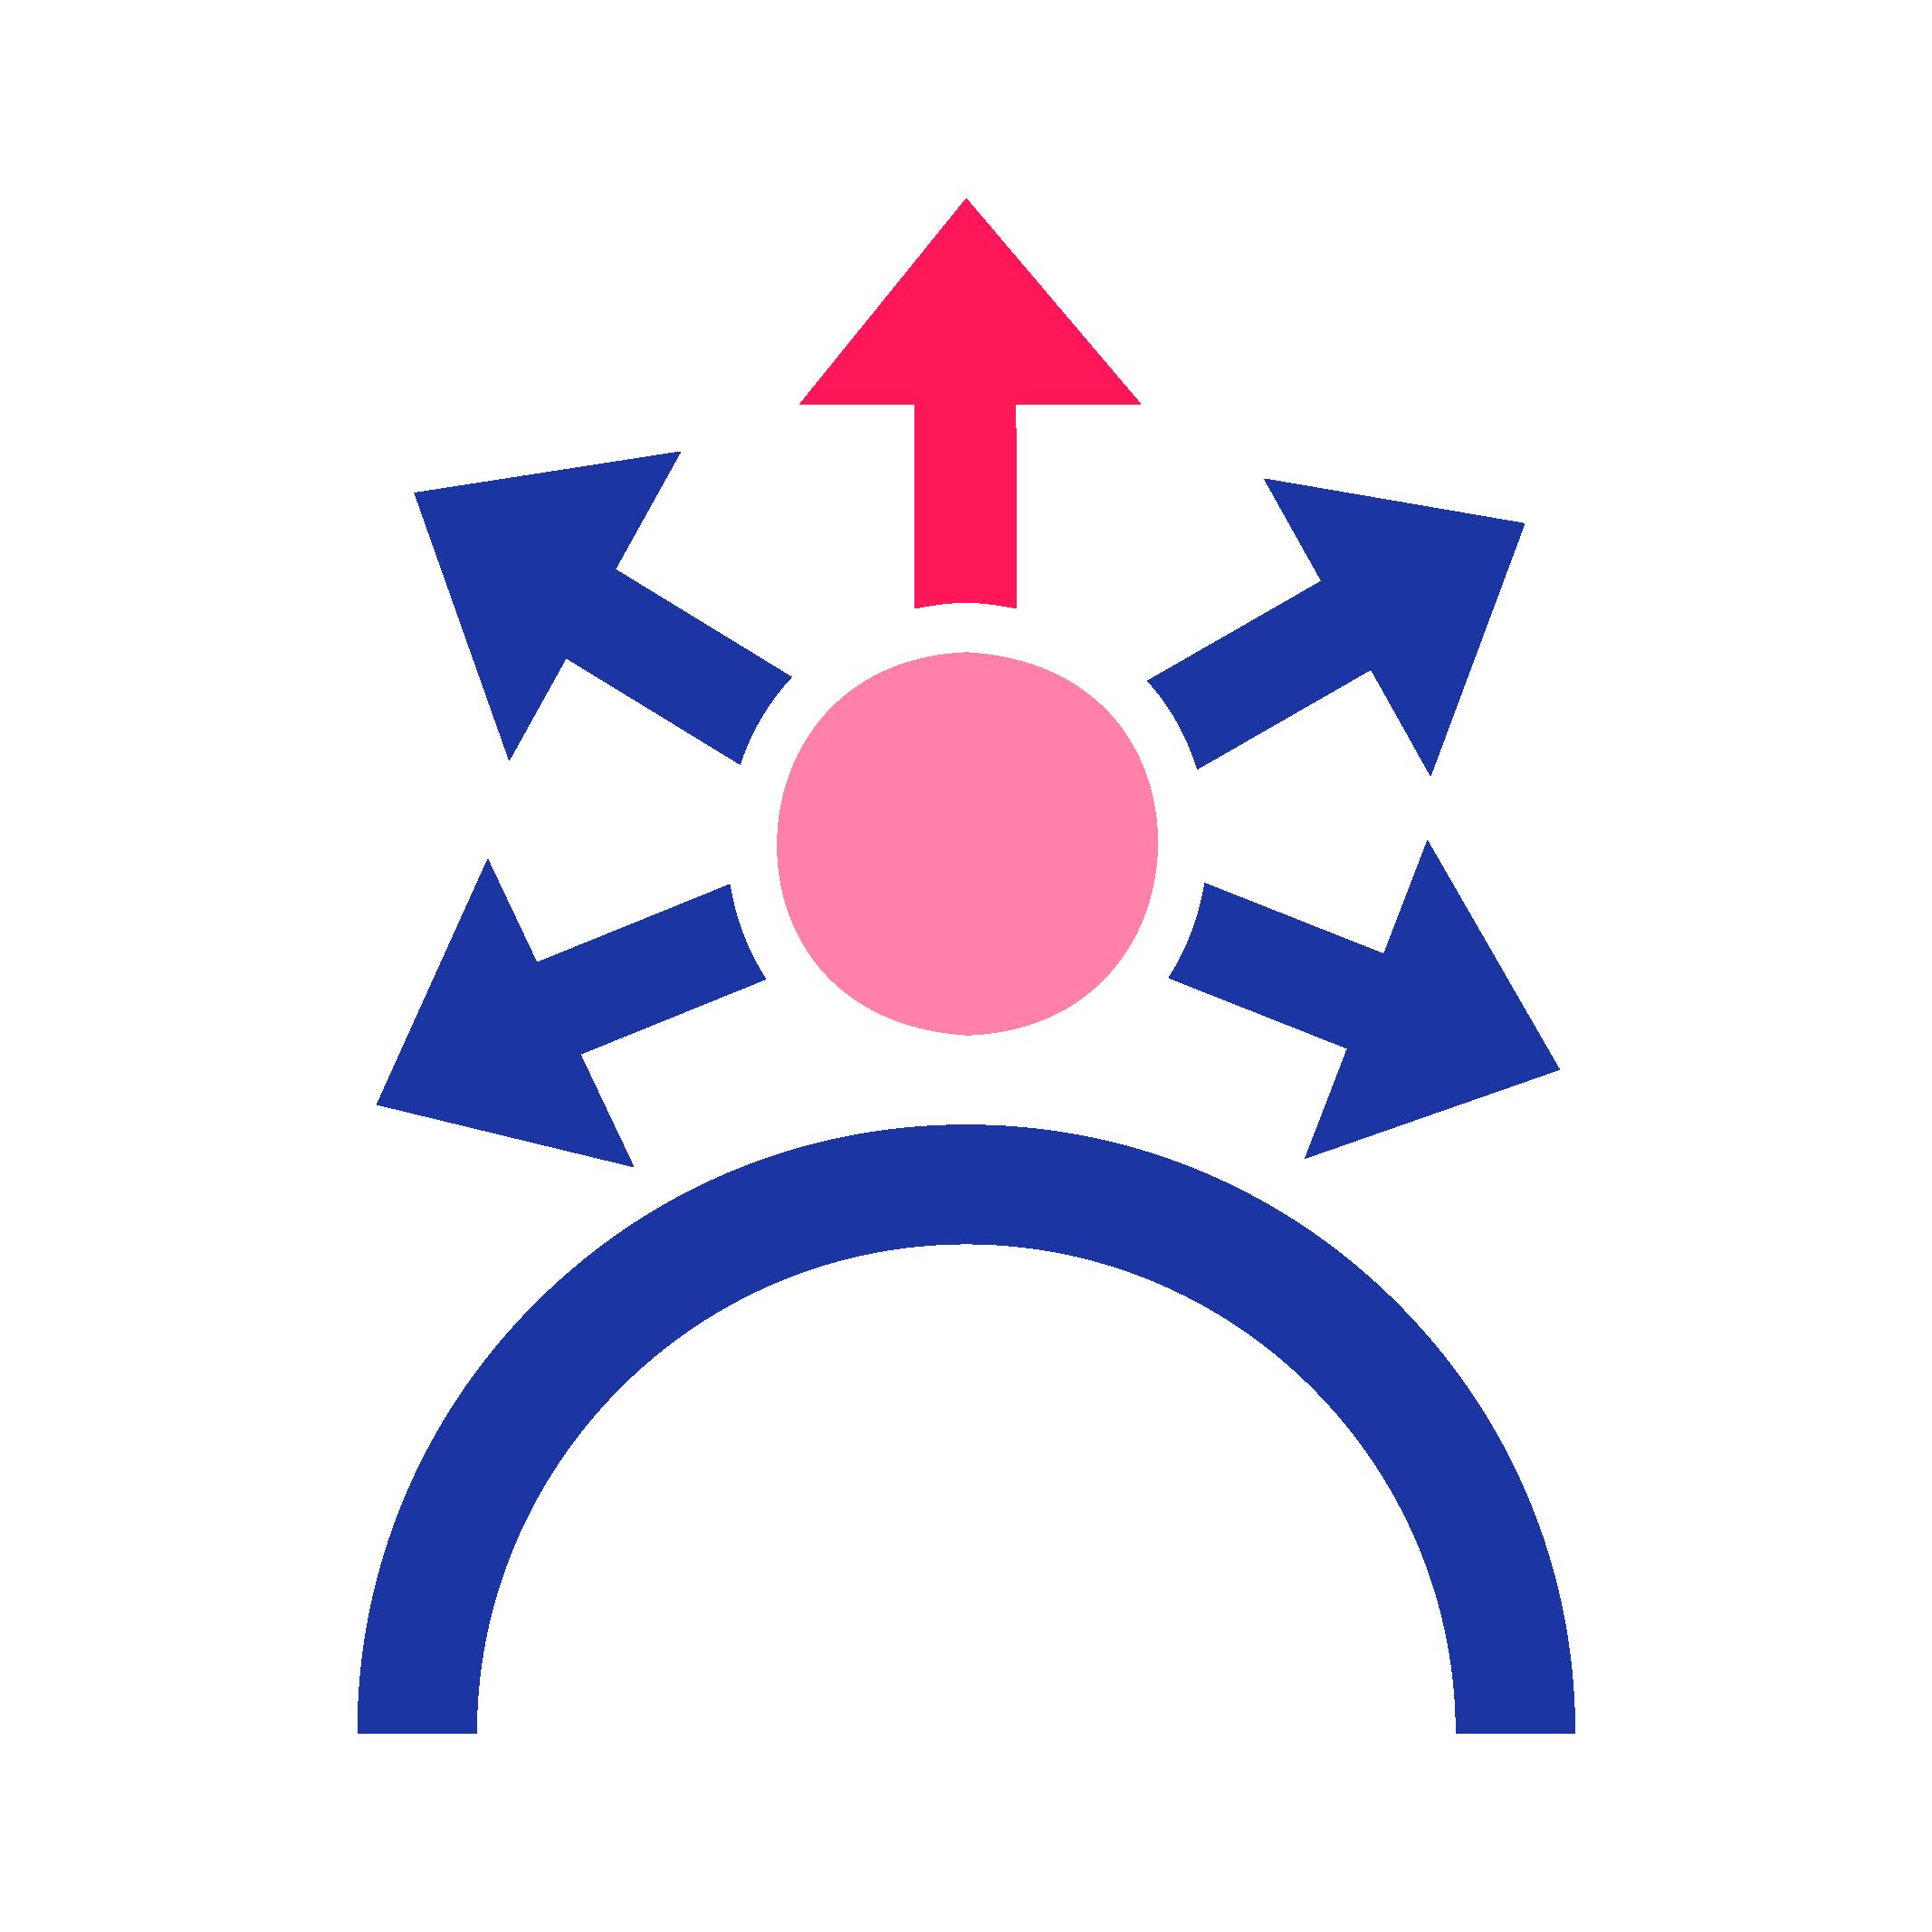 You grow section image